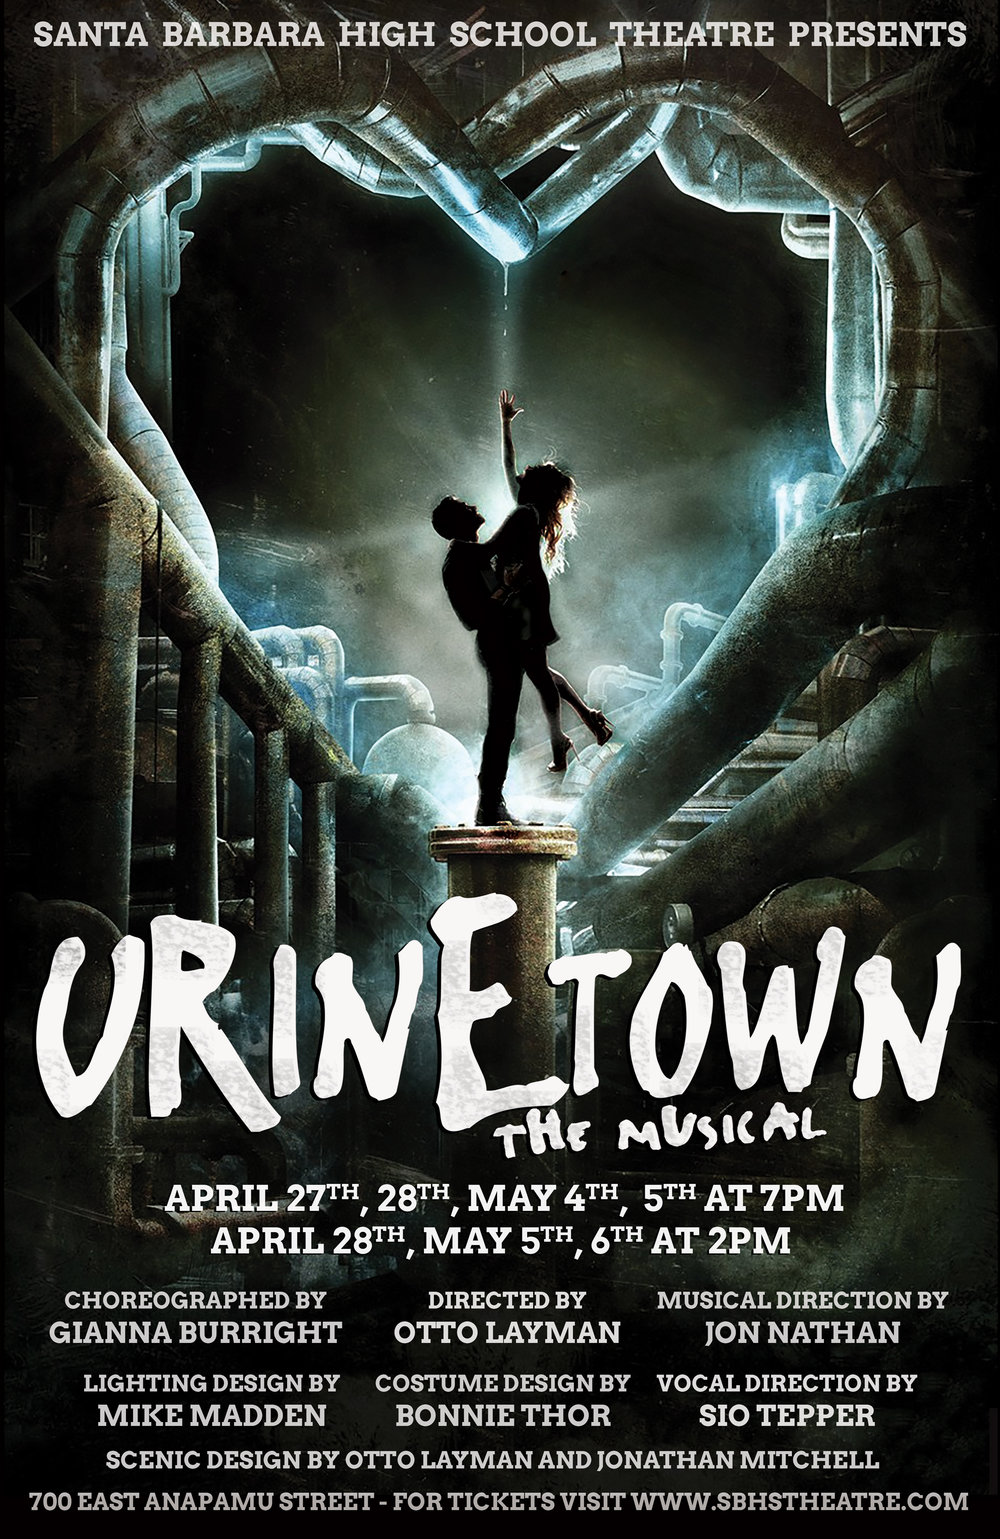 Urinetown-Poster-WEB.jpg